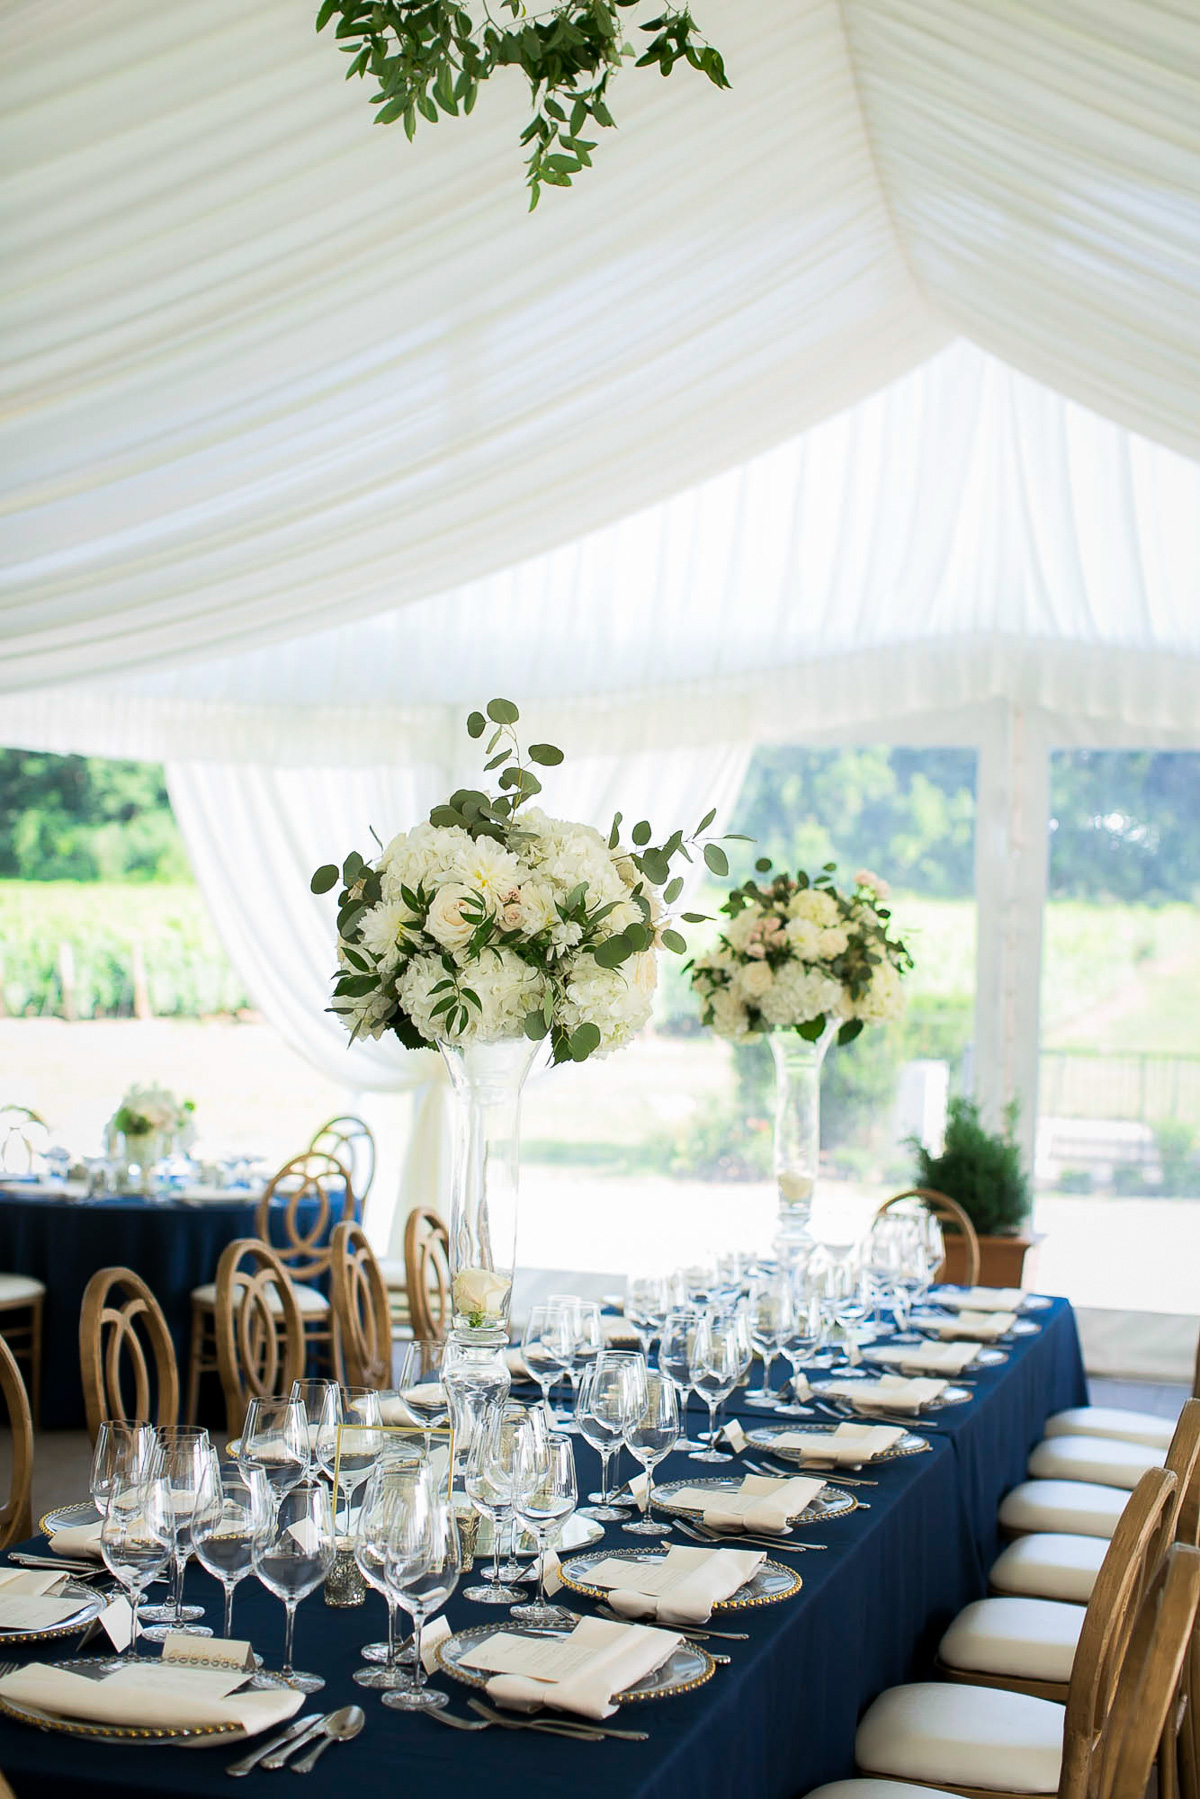 philosophy-studios-vineyard-bride-swish-list-chateau-des-charmes-niagara-on-the-lake-wedding-26.jpg